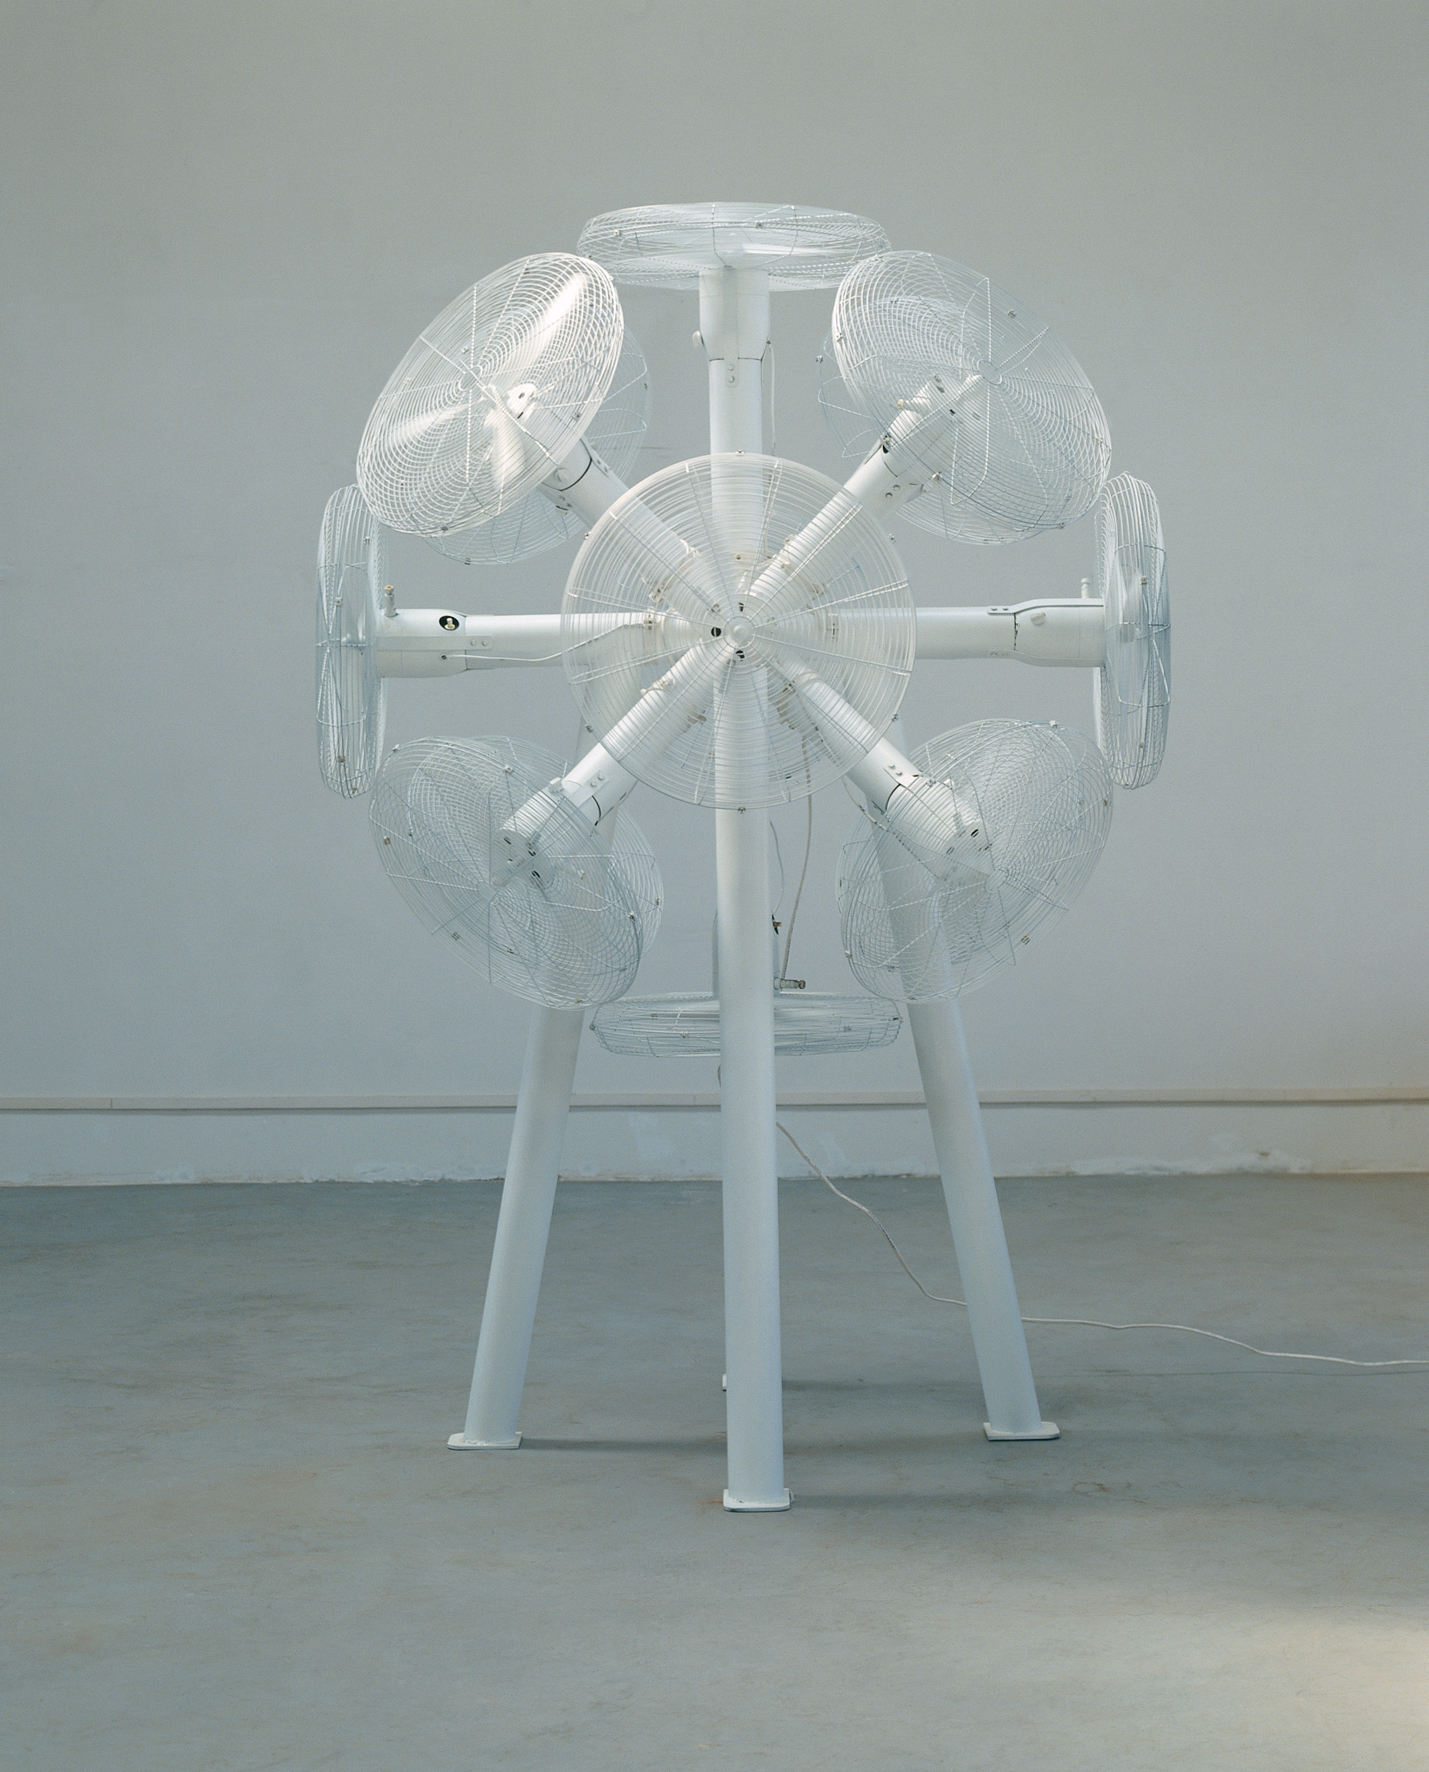 Gao Weigang 高伟刚, Buzz No.1 嗡嗡嗡一号, 2008, Electric installation and steel 电动装置、钢, 270 x 190 x 190 cm